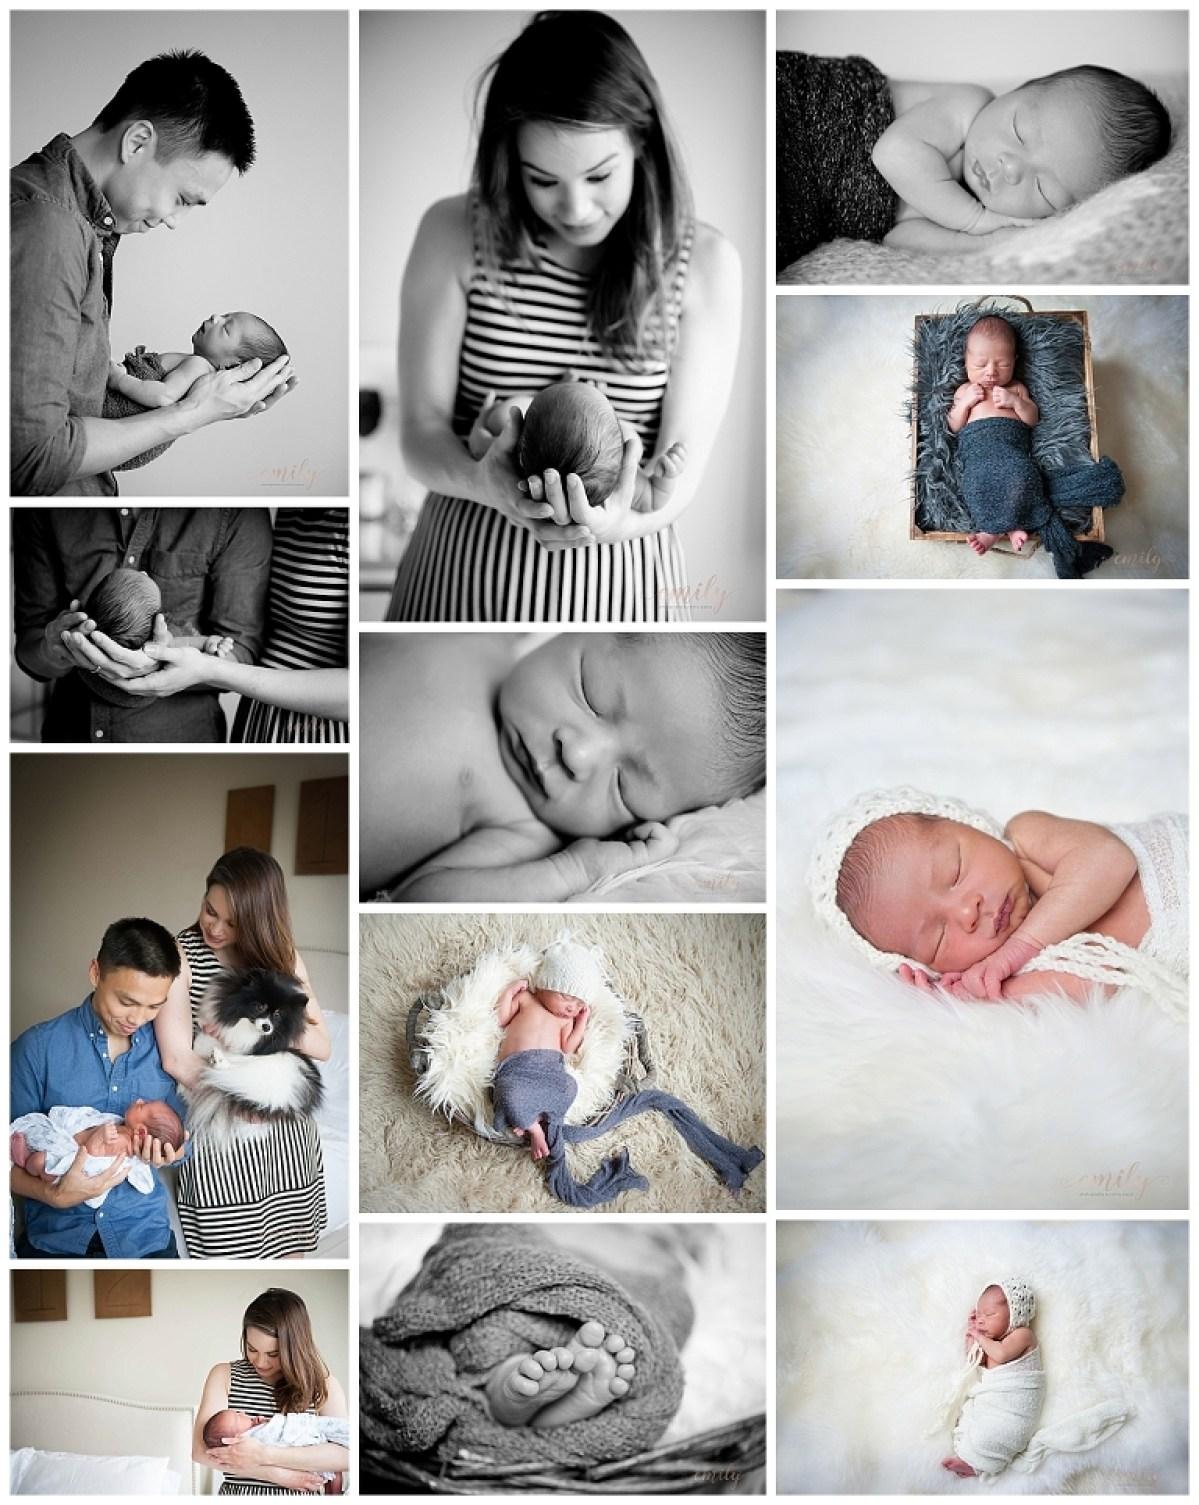 newborn photography by emily payne